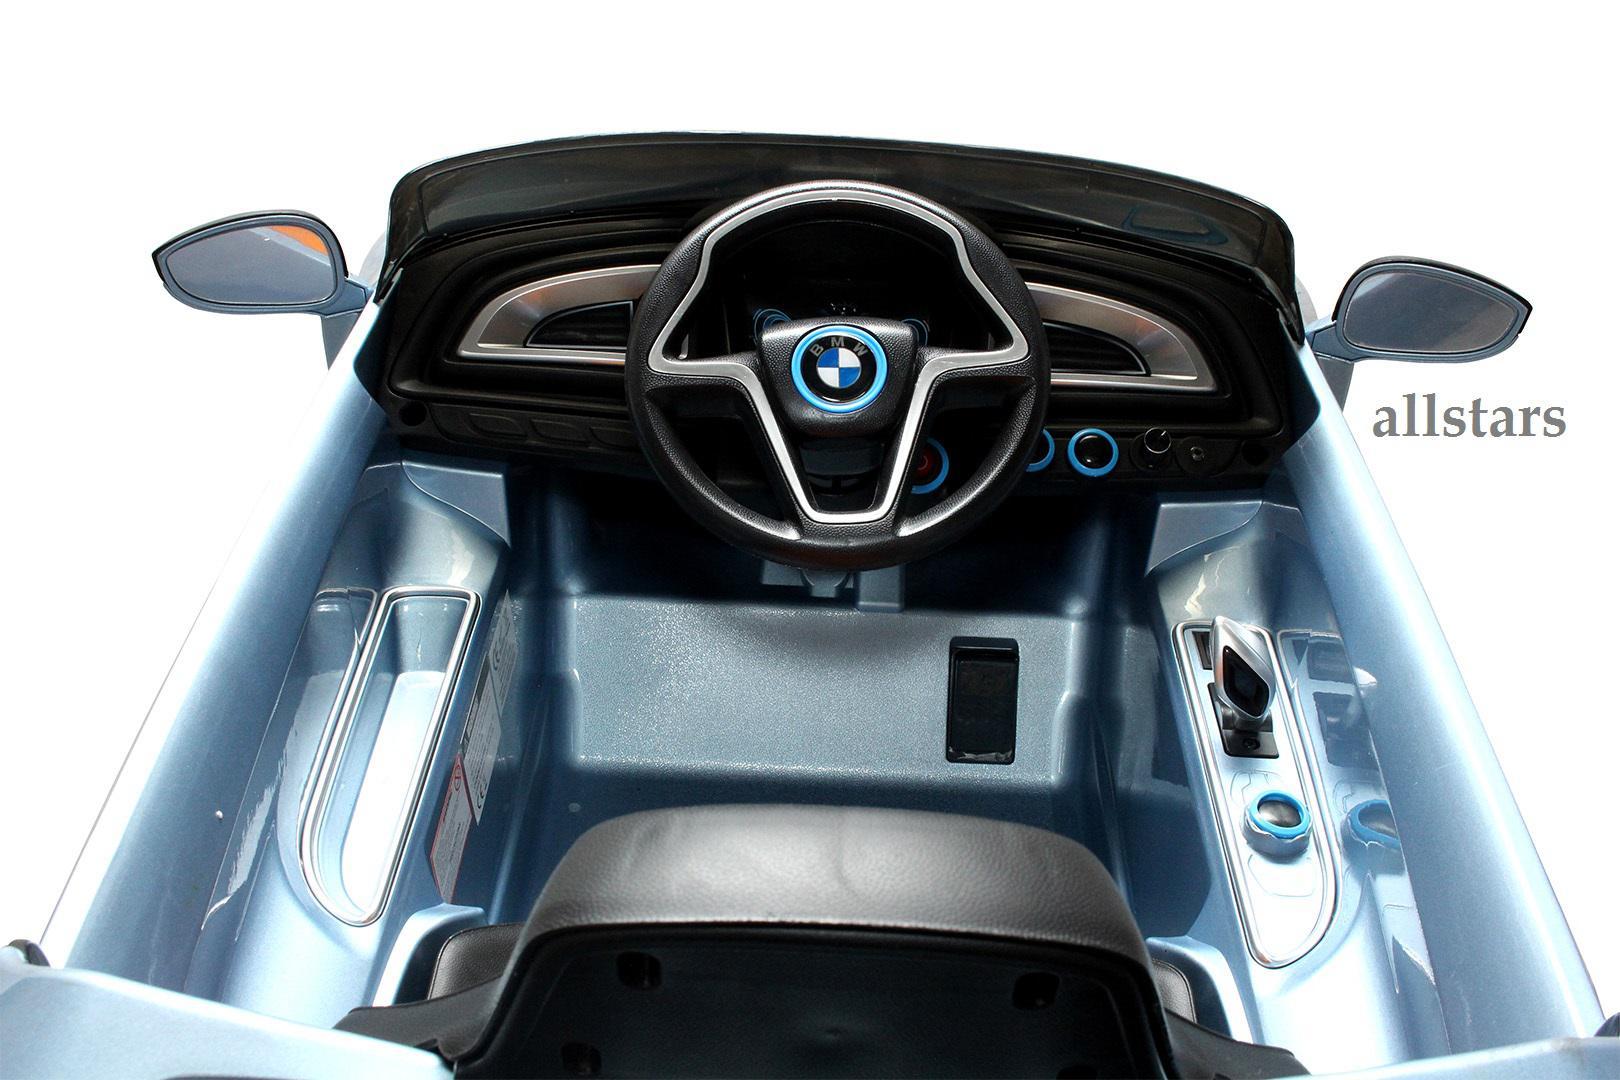 Allstars Kinder Elektroauto BMW I8 metallic-hellblau mit ...